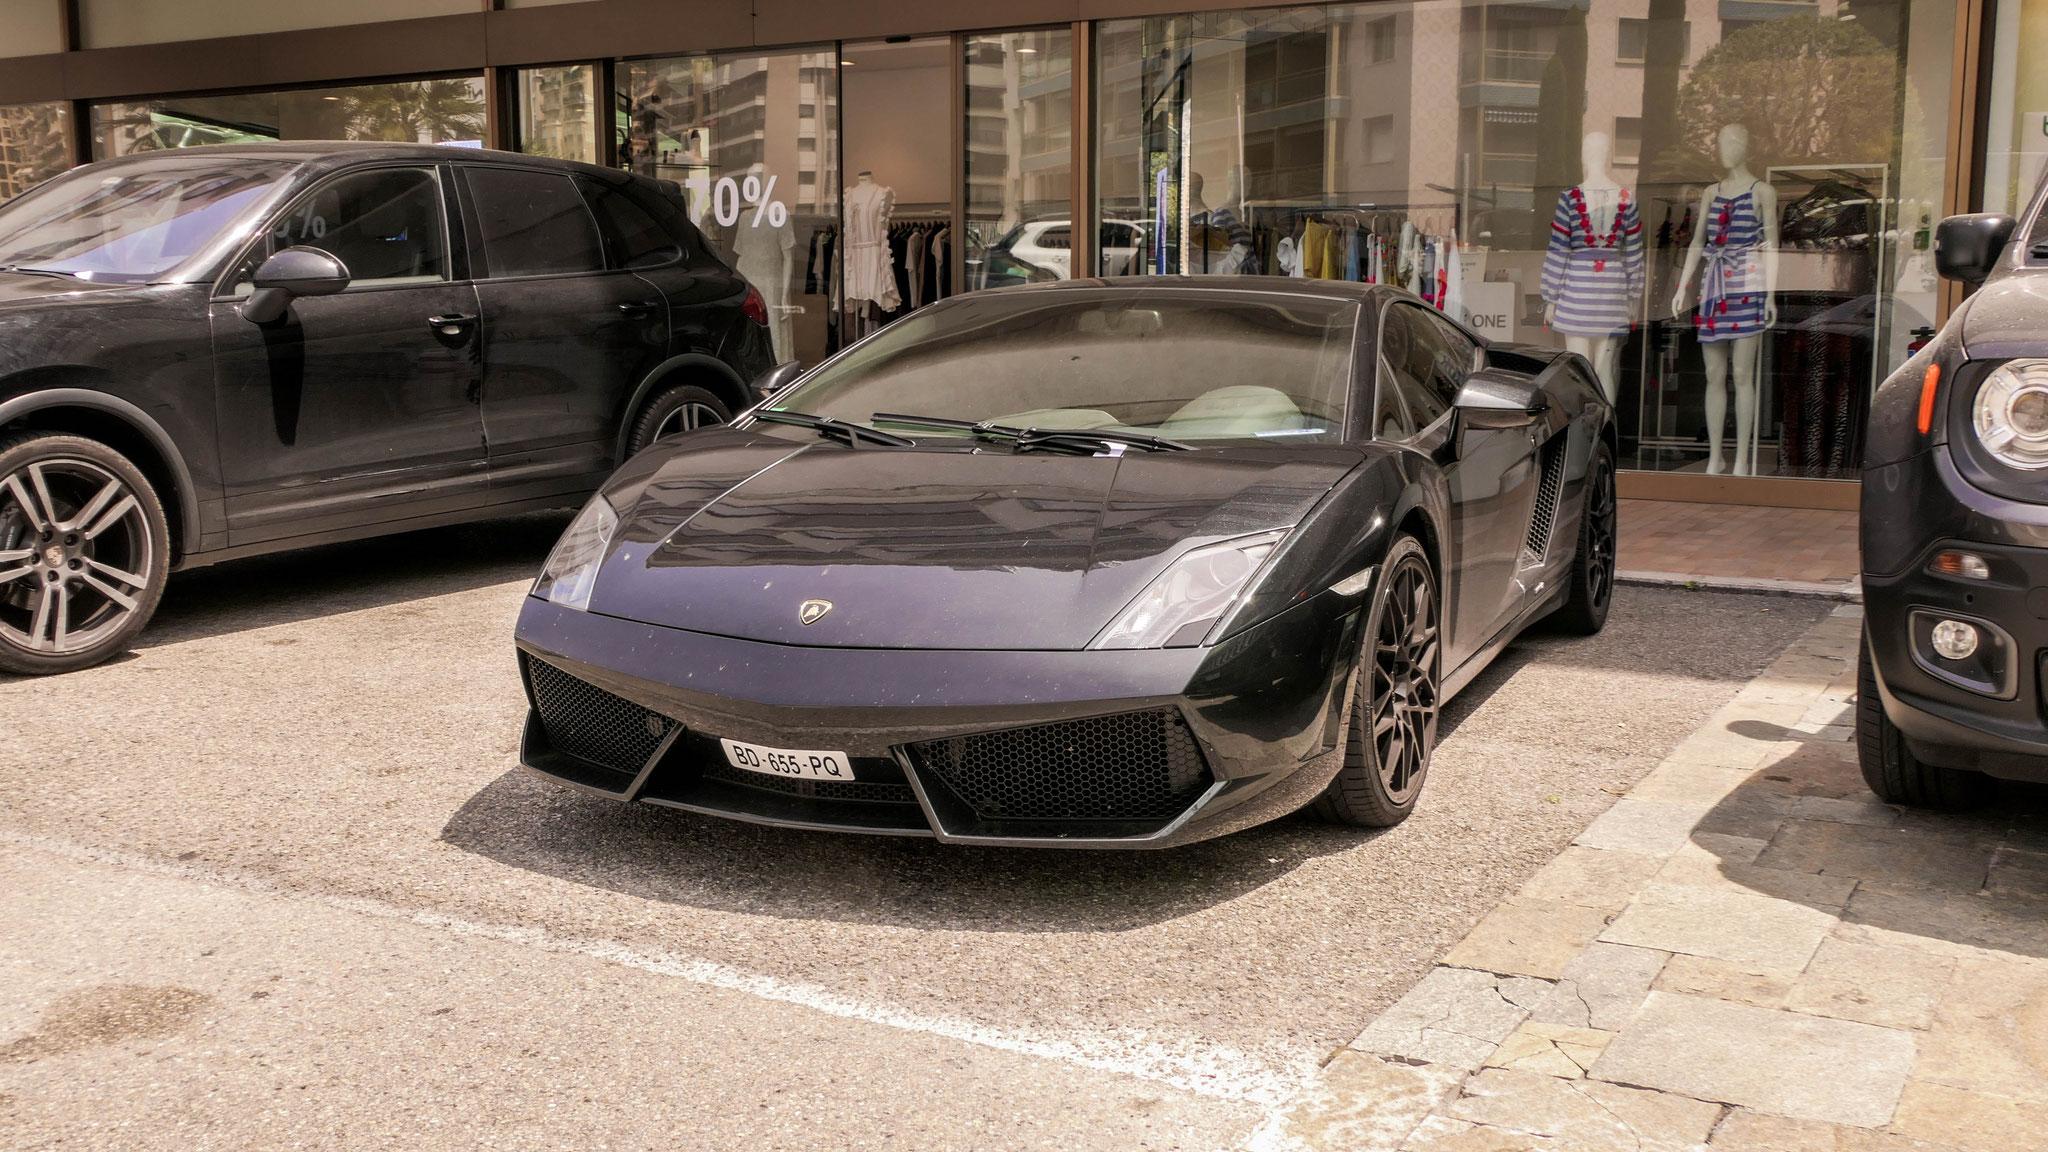 Lamborghini Gallardo Coupé - BD-655-PQ (ITA)